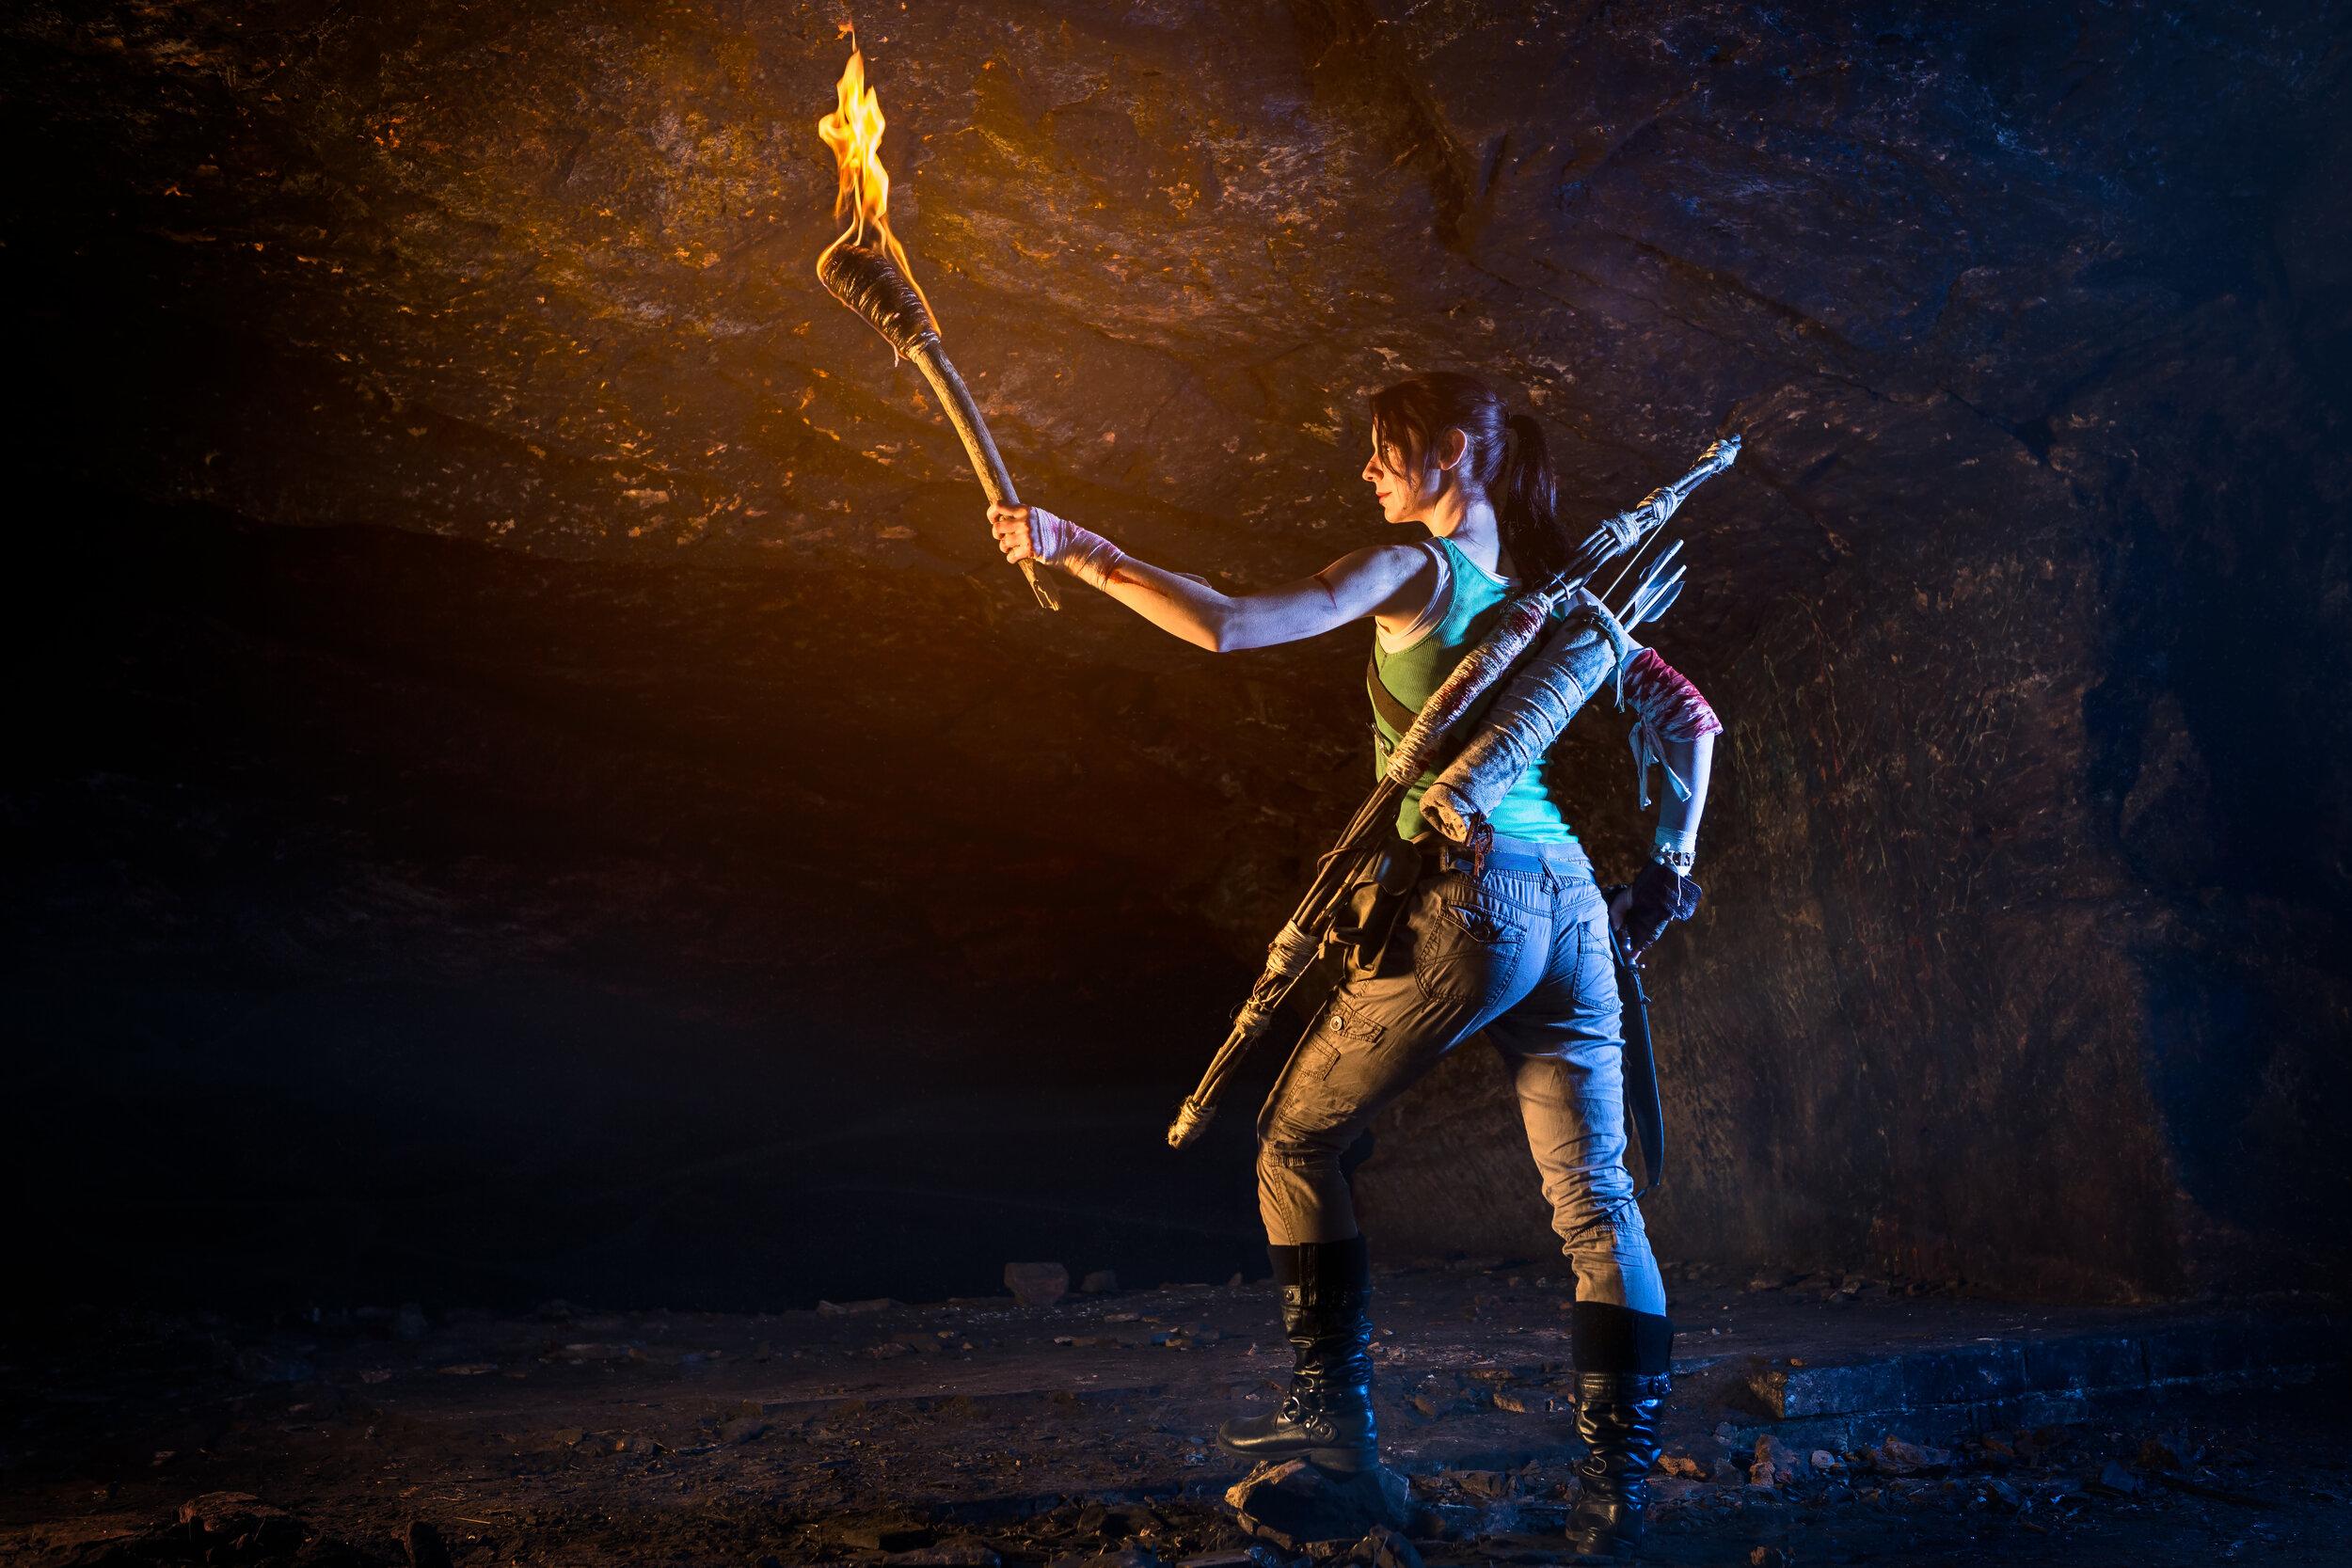 The Gamehers Being Lara Croft